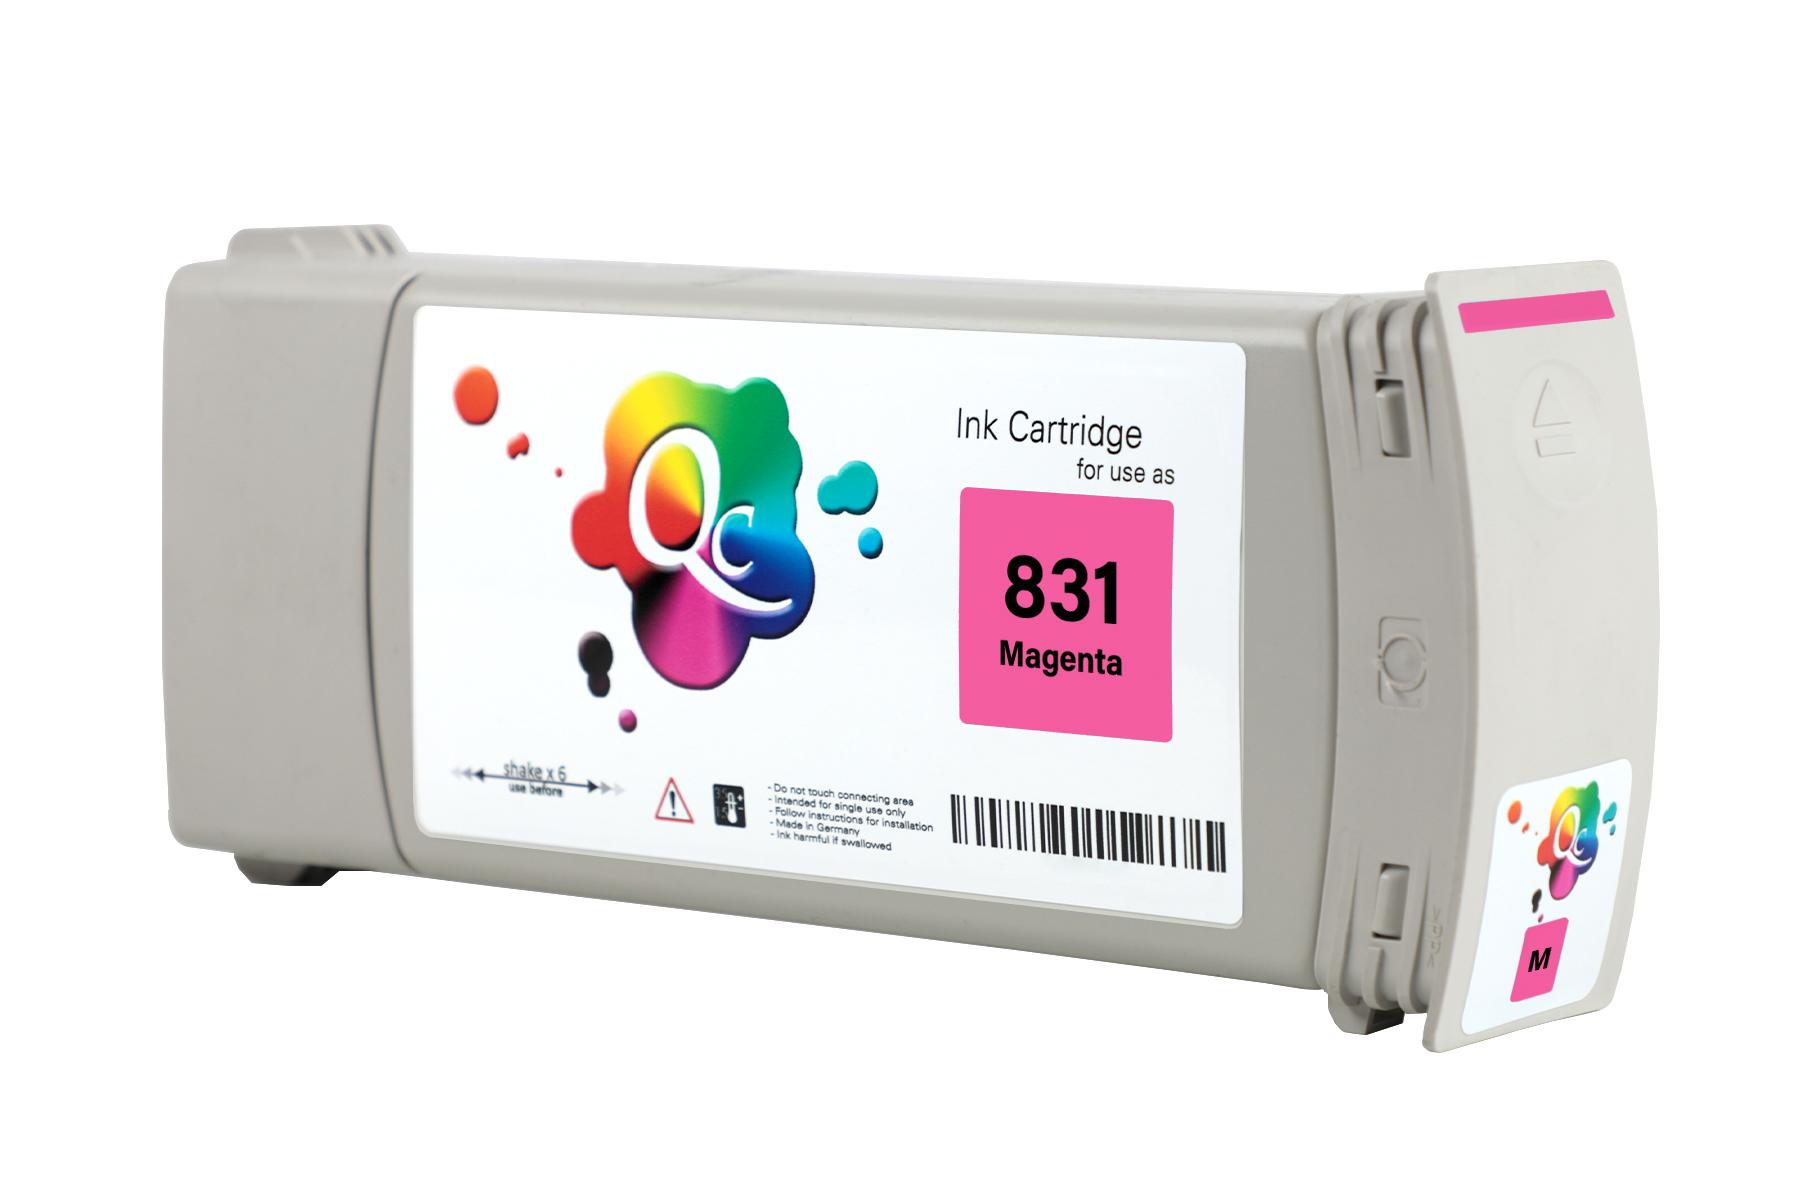 HP 831 CZ696A Magenta Kırmızı Lateks Muadil Mürekkep Kartuş 775ml